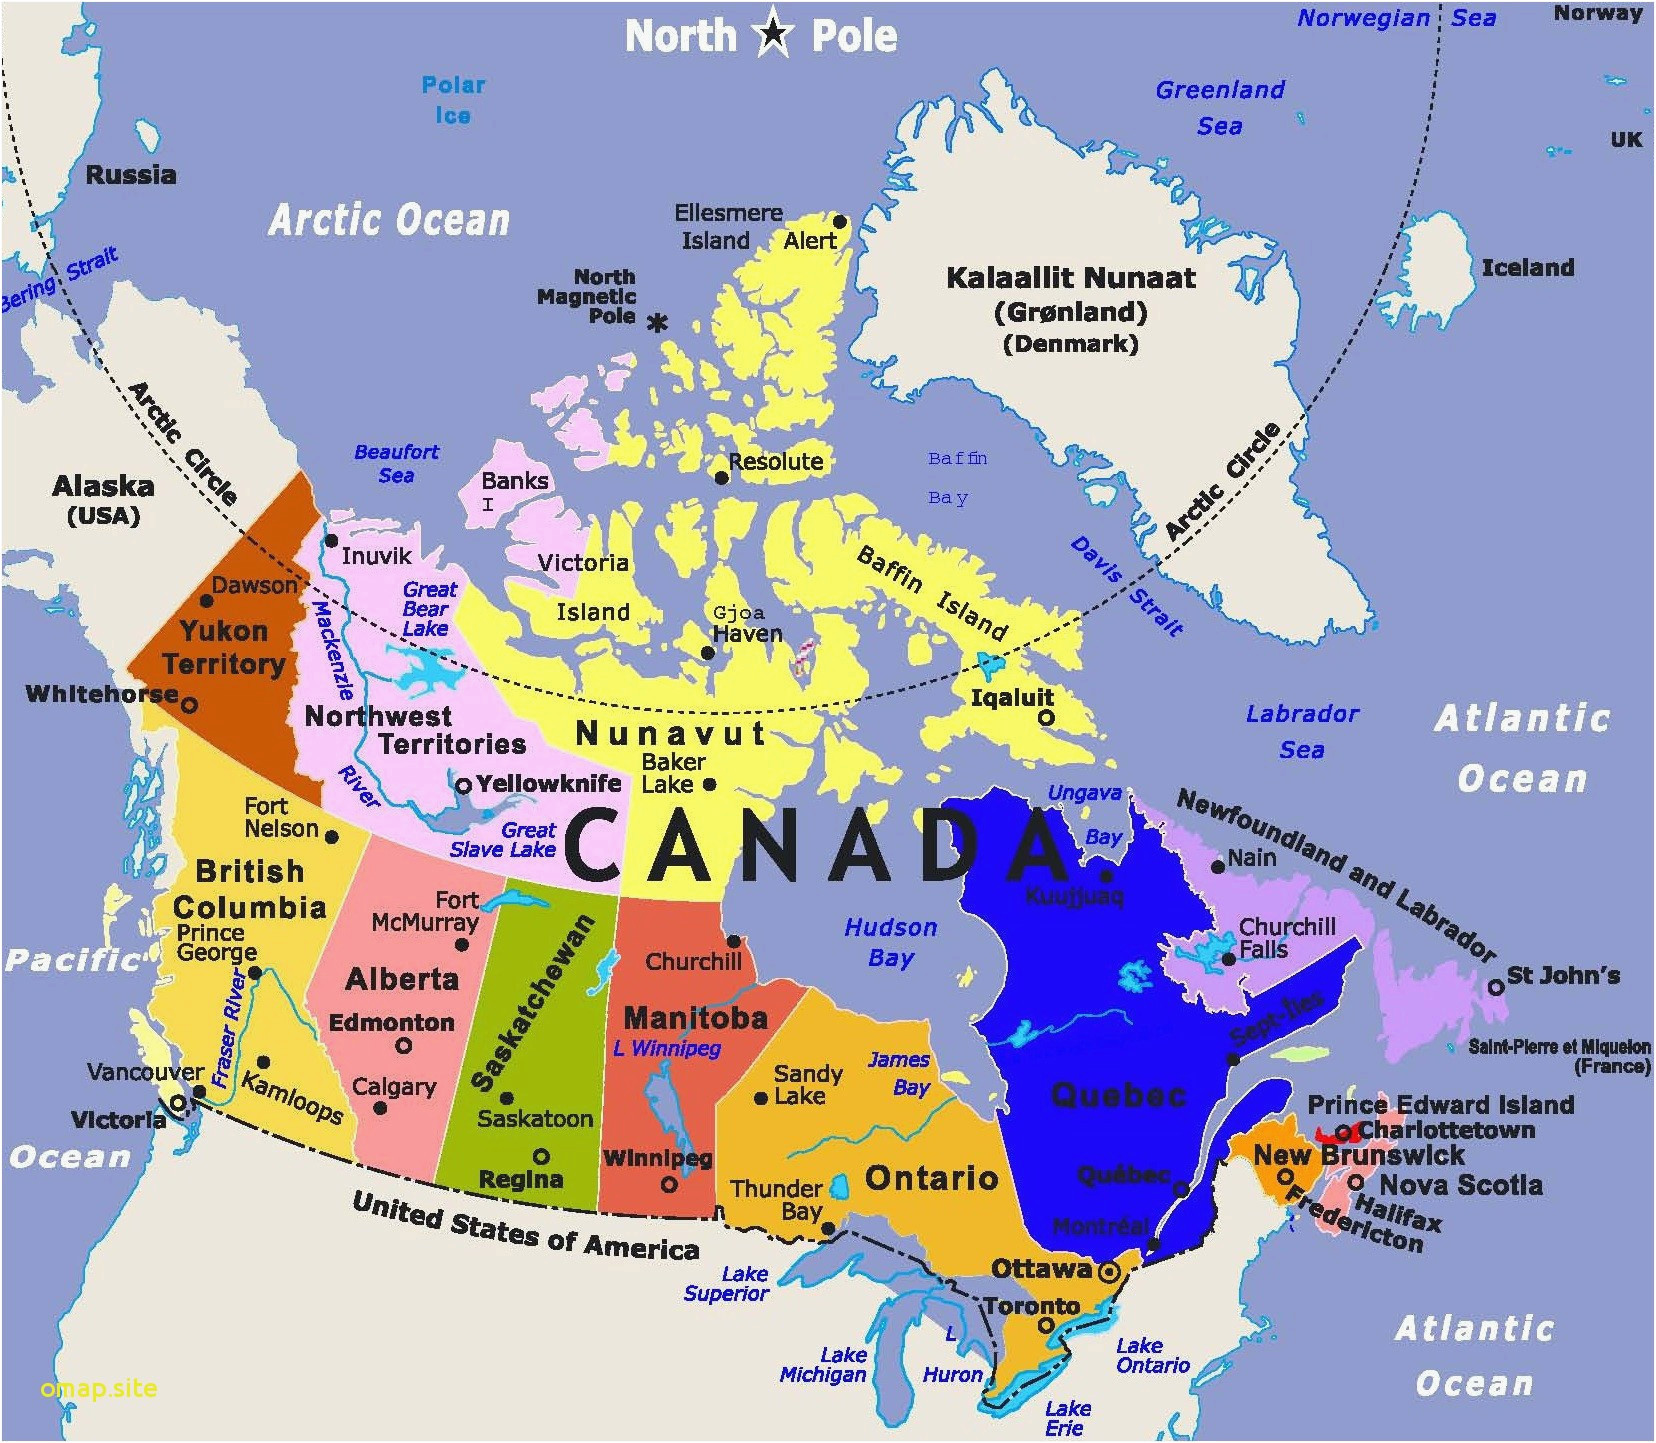 Winnipeg Canada Map Google Hudson Ohio Map Hudson Bay On A Map Ungava Bay Canada Map Stock Map